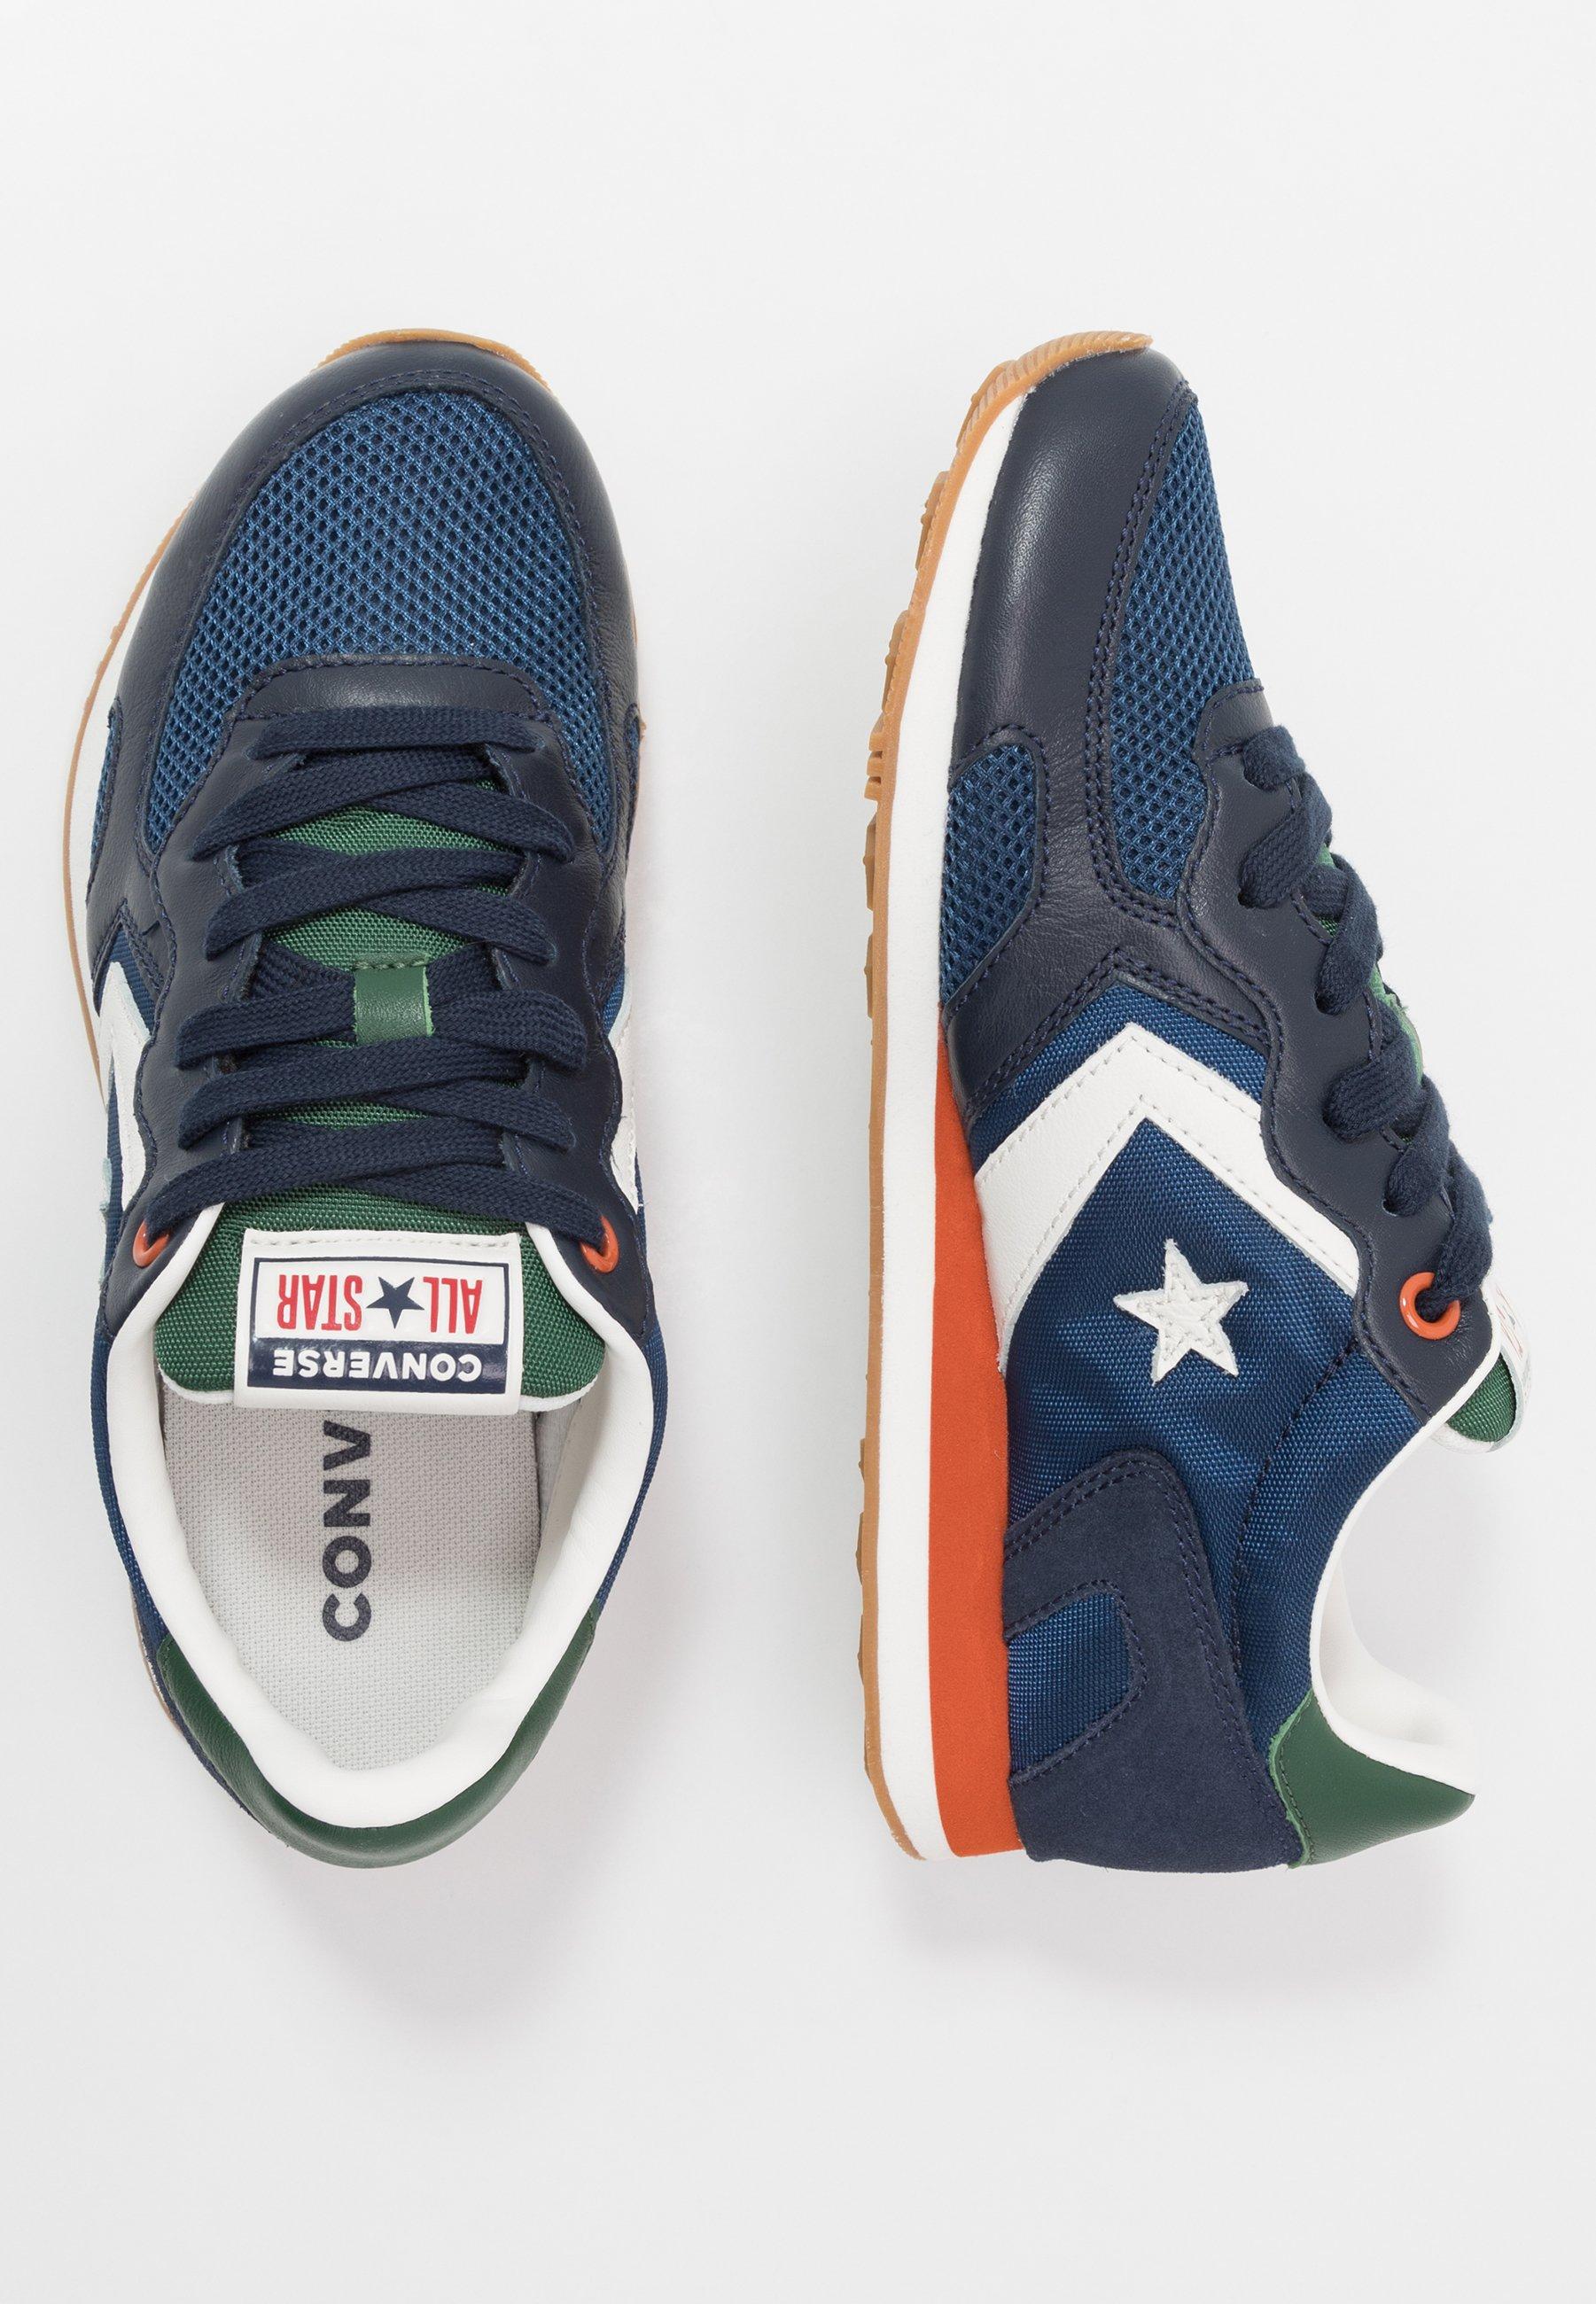 Converse THUNDERBOLT - Sneakers basse - navy/blu scuro - Zalando.it